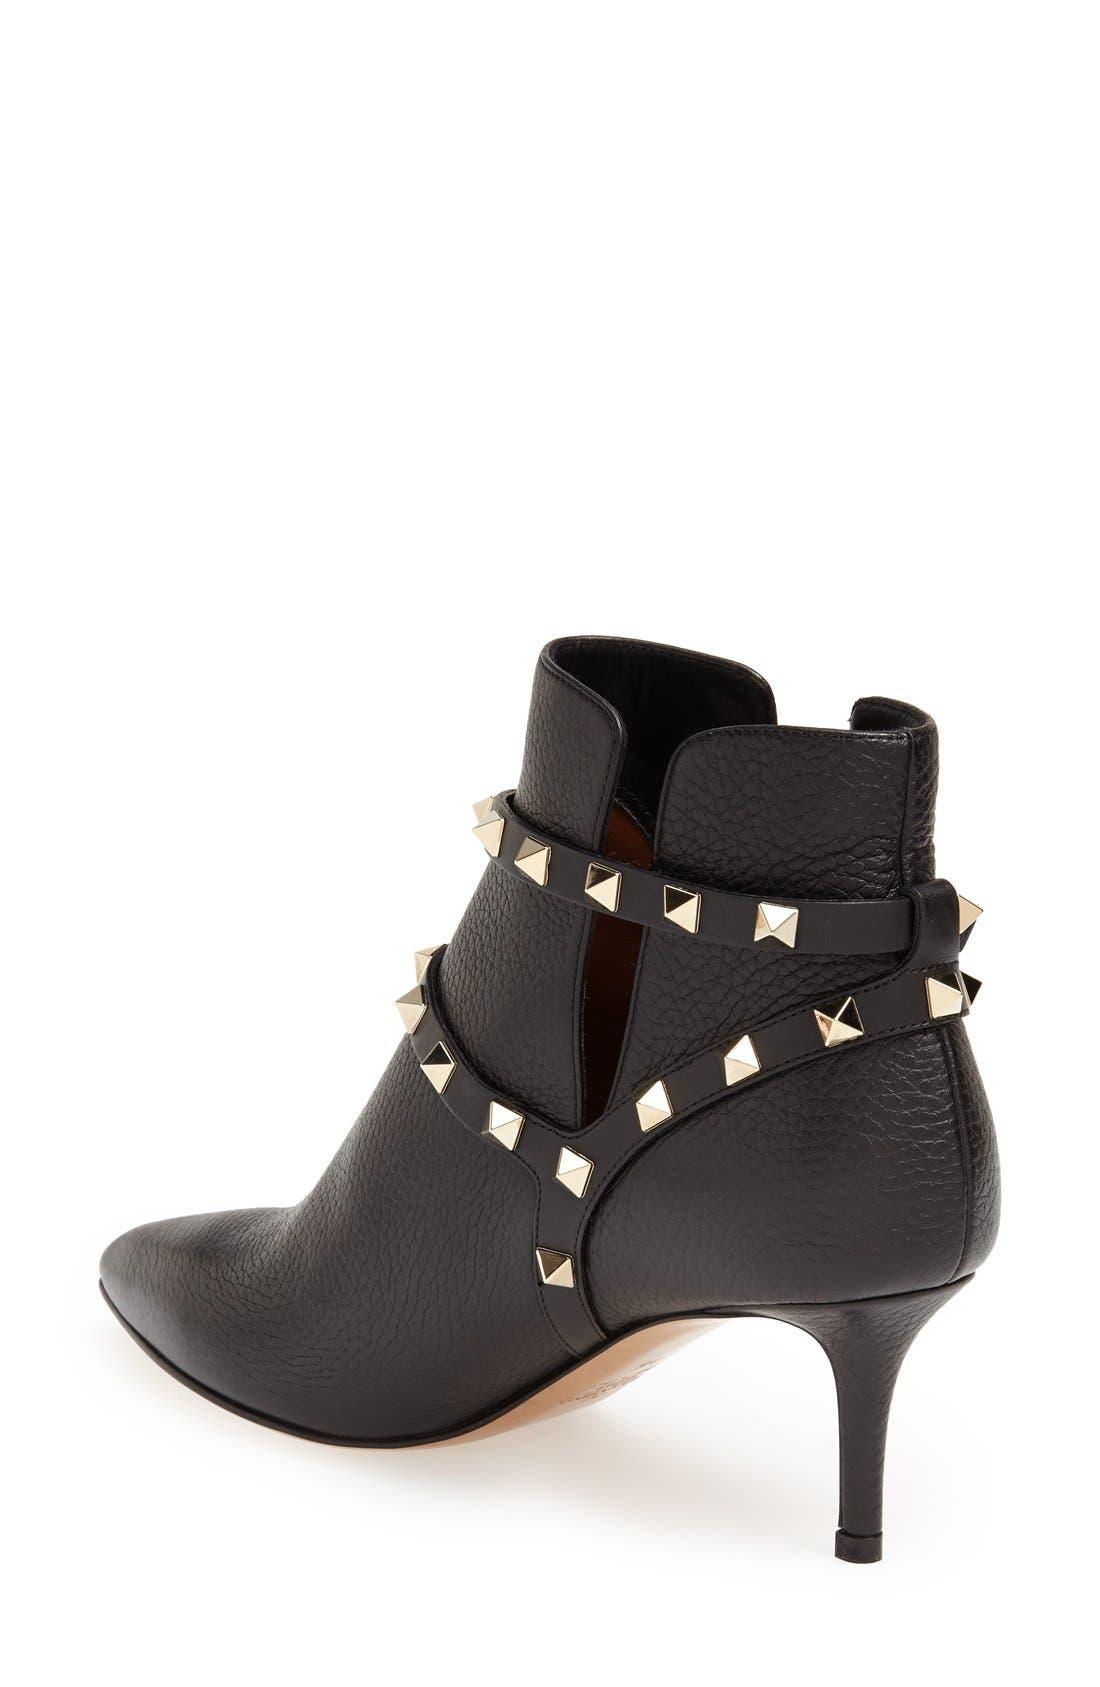 Alternate Image 2  - Valentino 'Rockstud' Pointy Toe Calfskin Leather Bootie (Women)